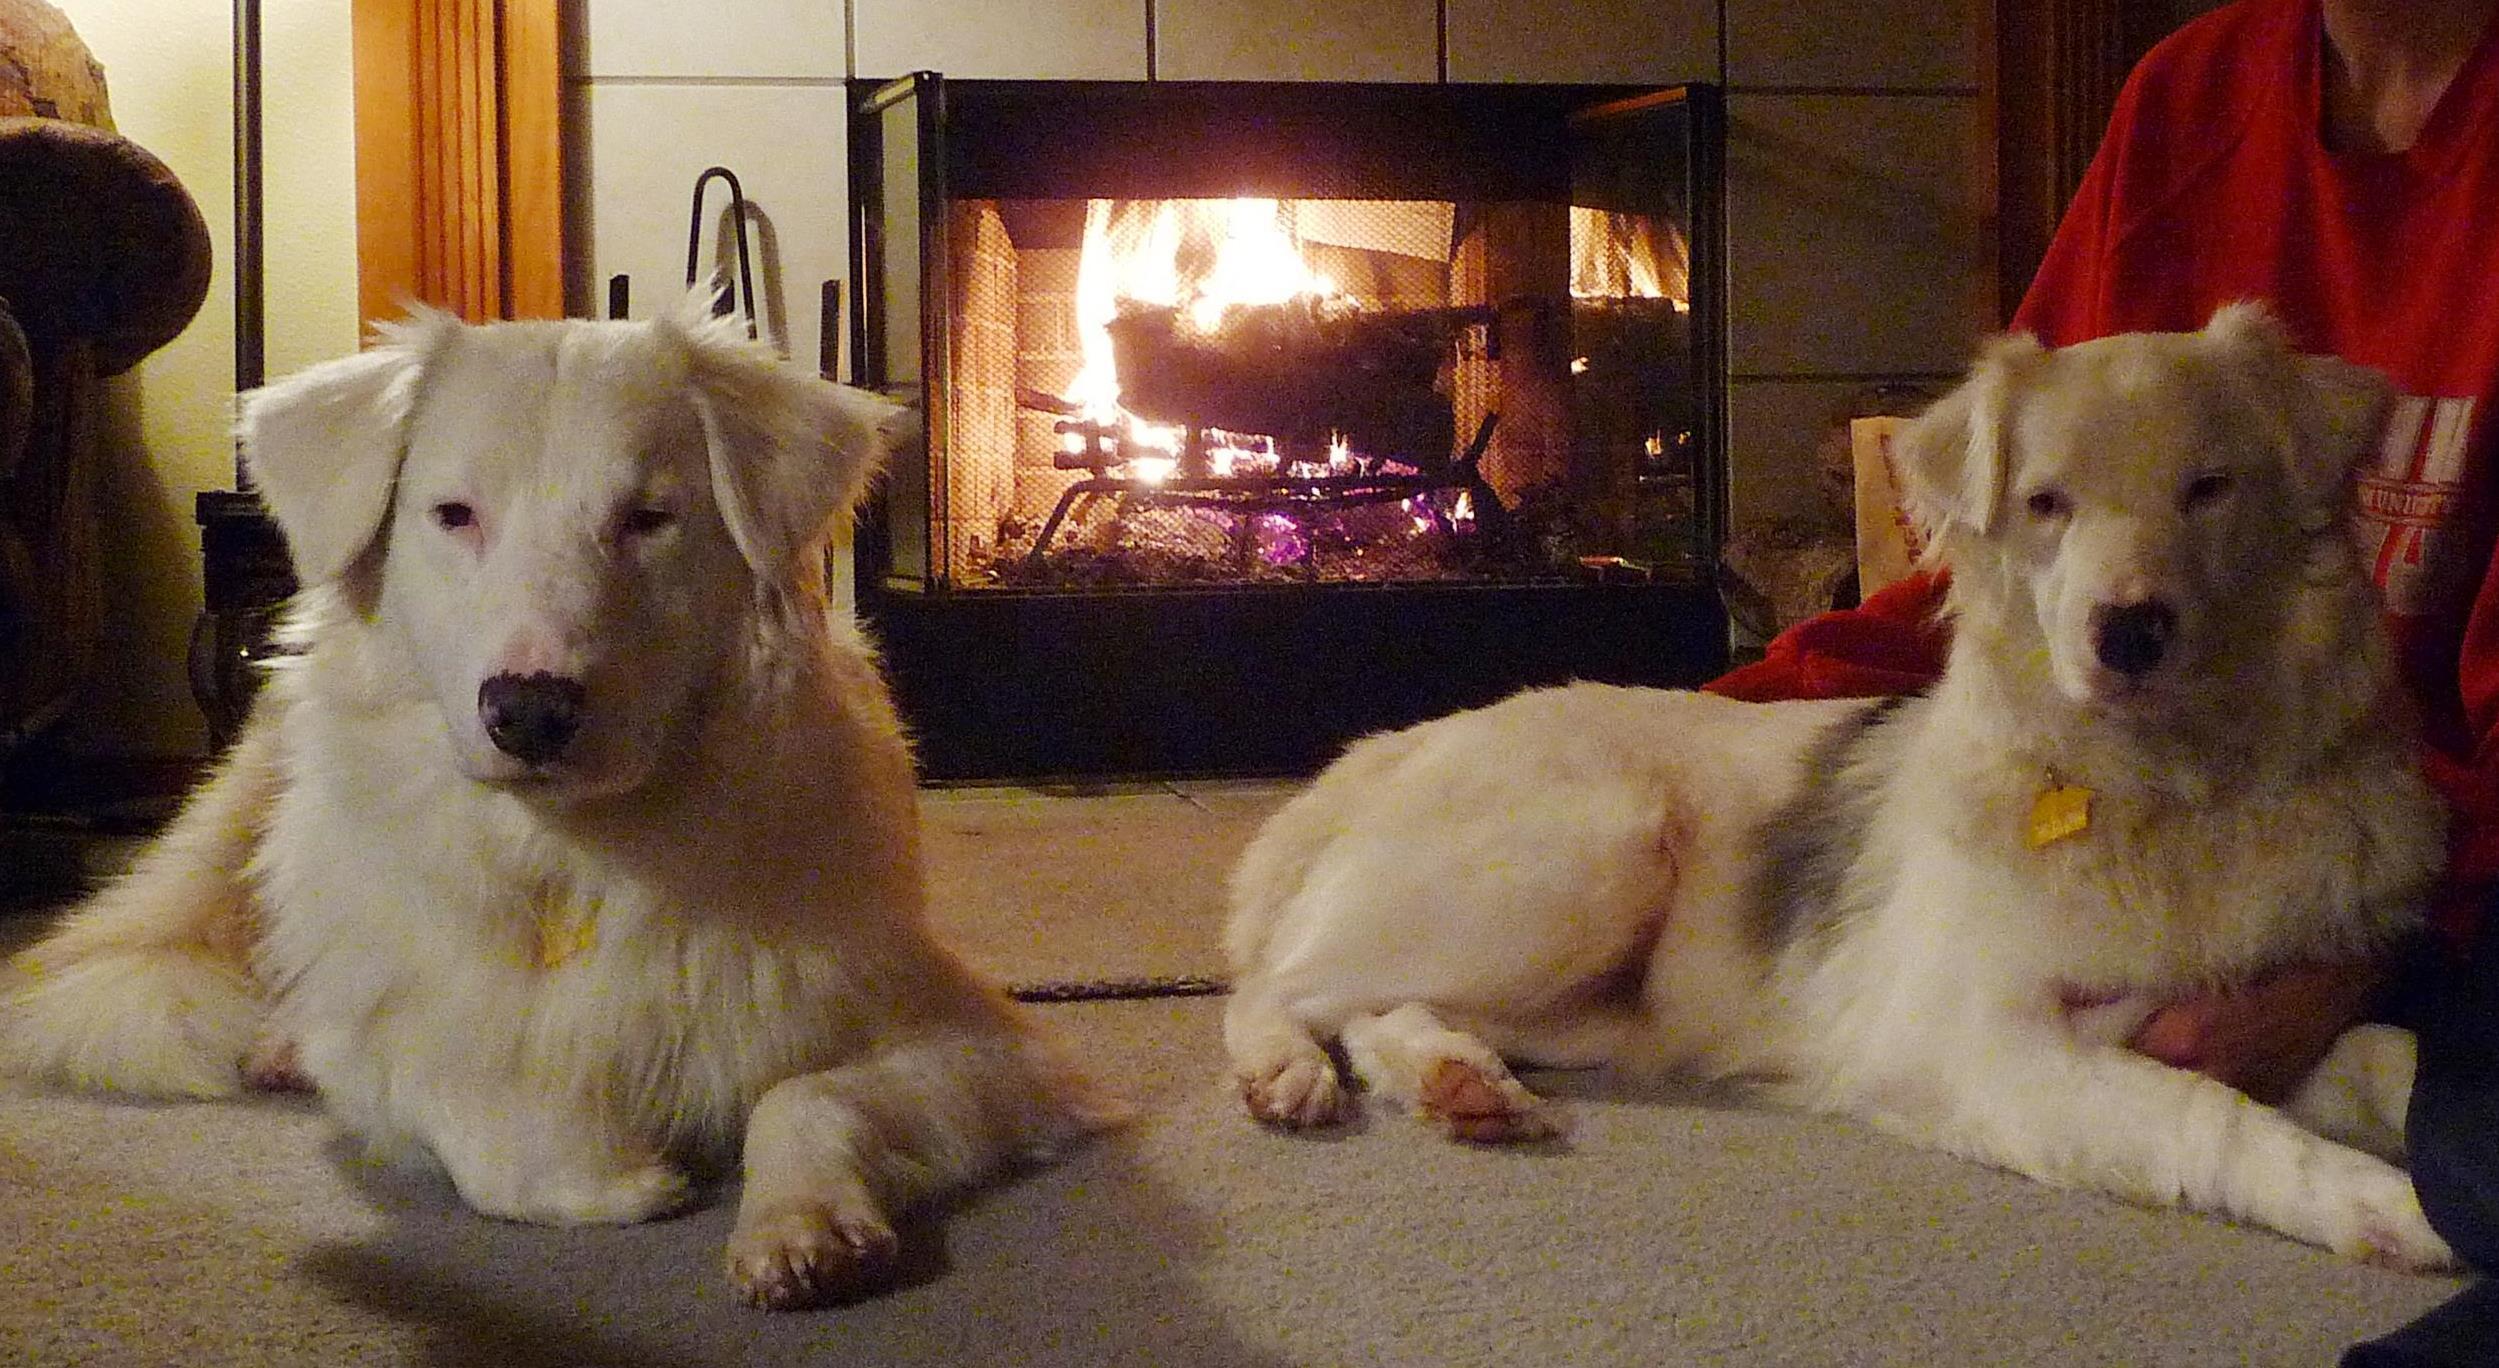 1-10-14-Charming-and-Snow-enjoying-a-fire.jpg